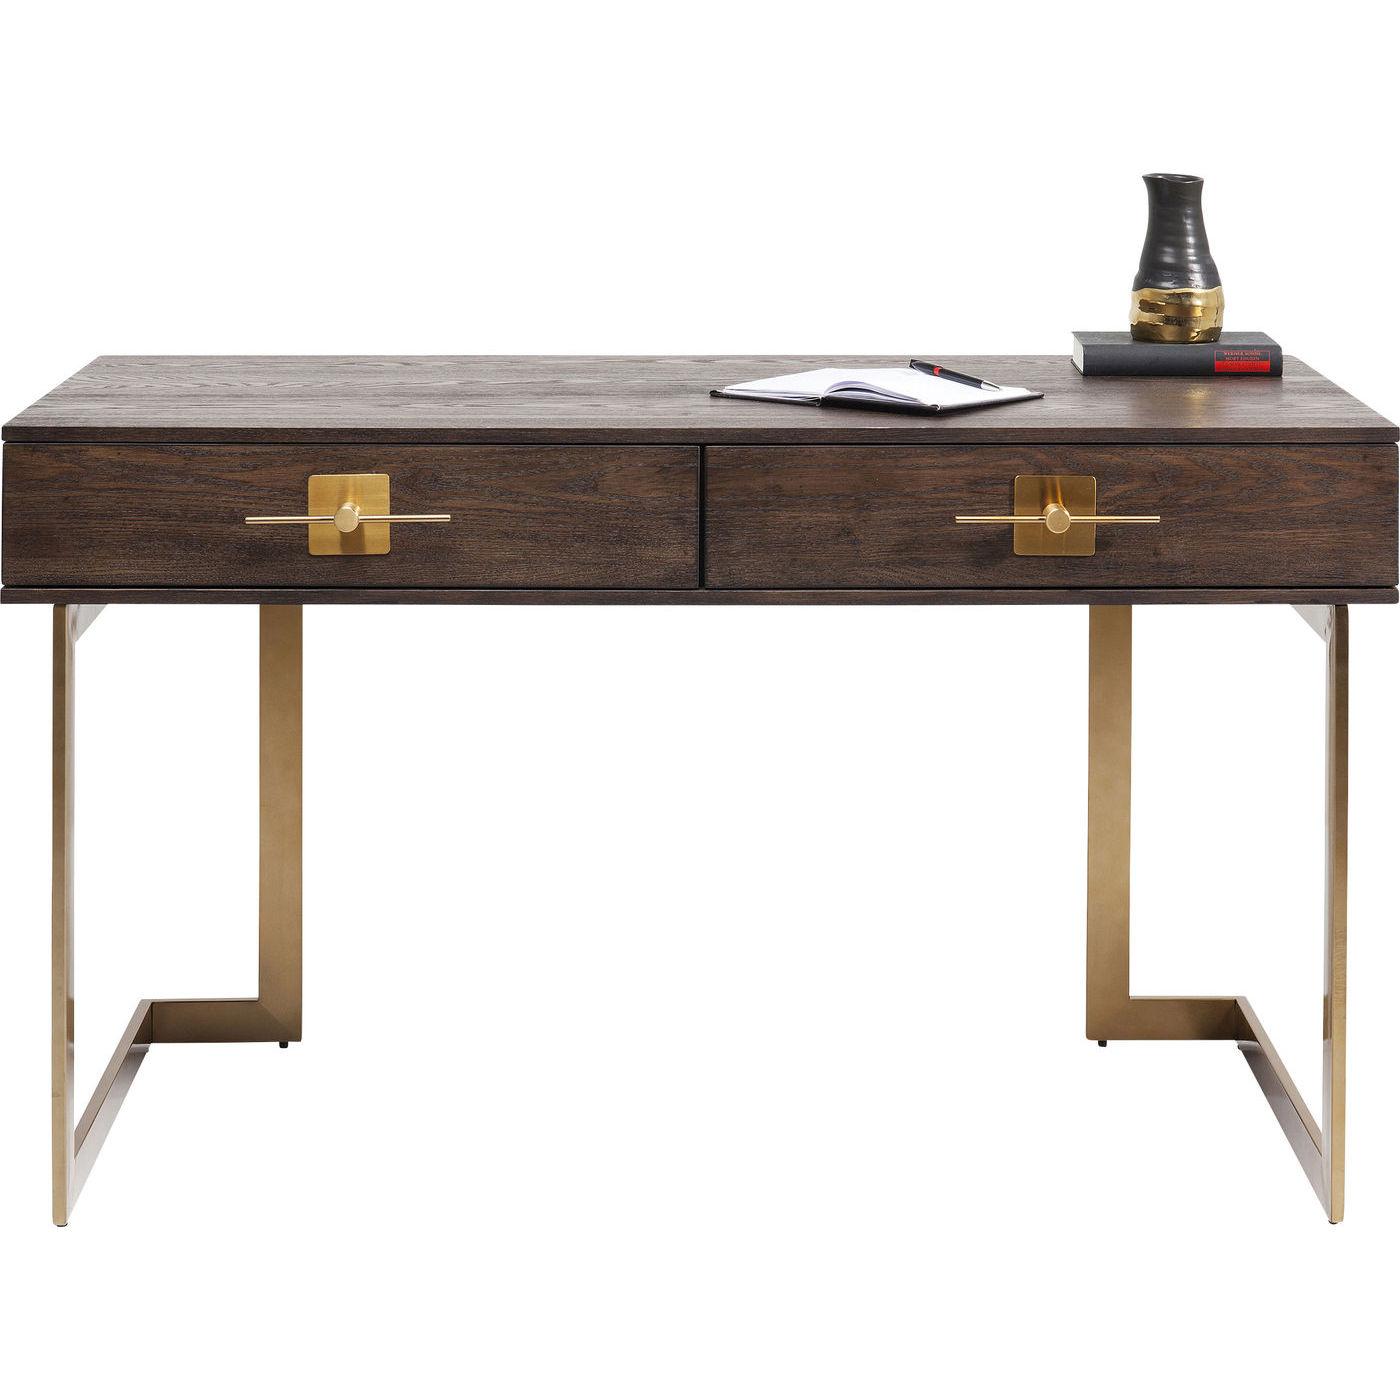 KARE DESIGN Osaka skrivebord - brunt asketræsfinér/messing stål, m. 2 skuffer (138x60)